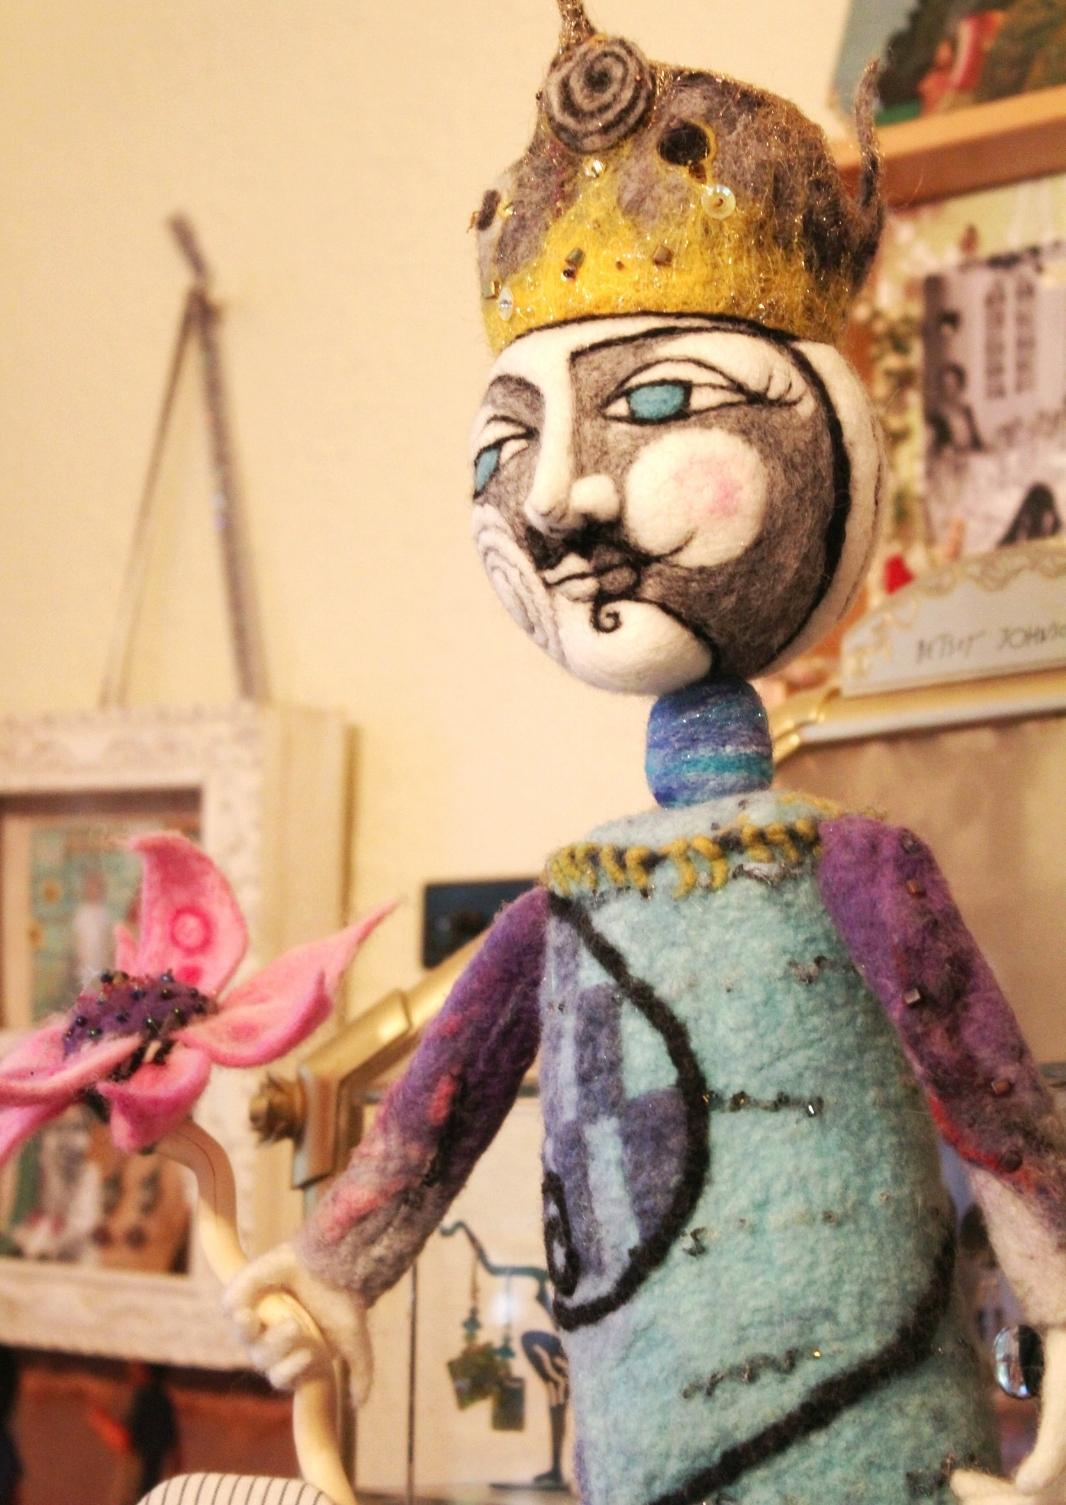 felted fantasy sculpture by Caroline Daley